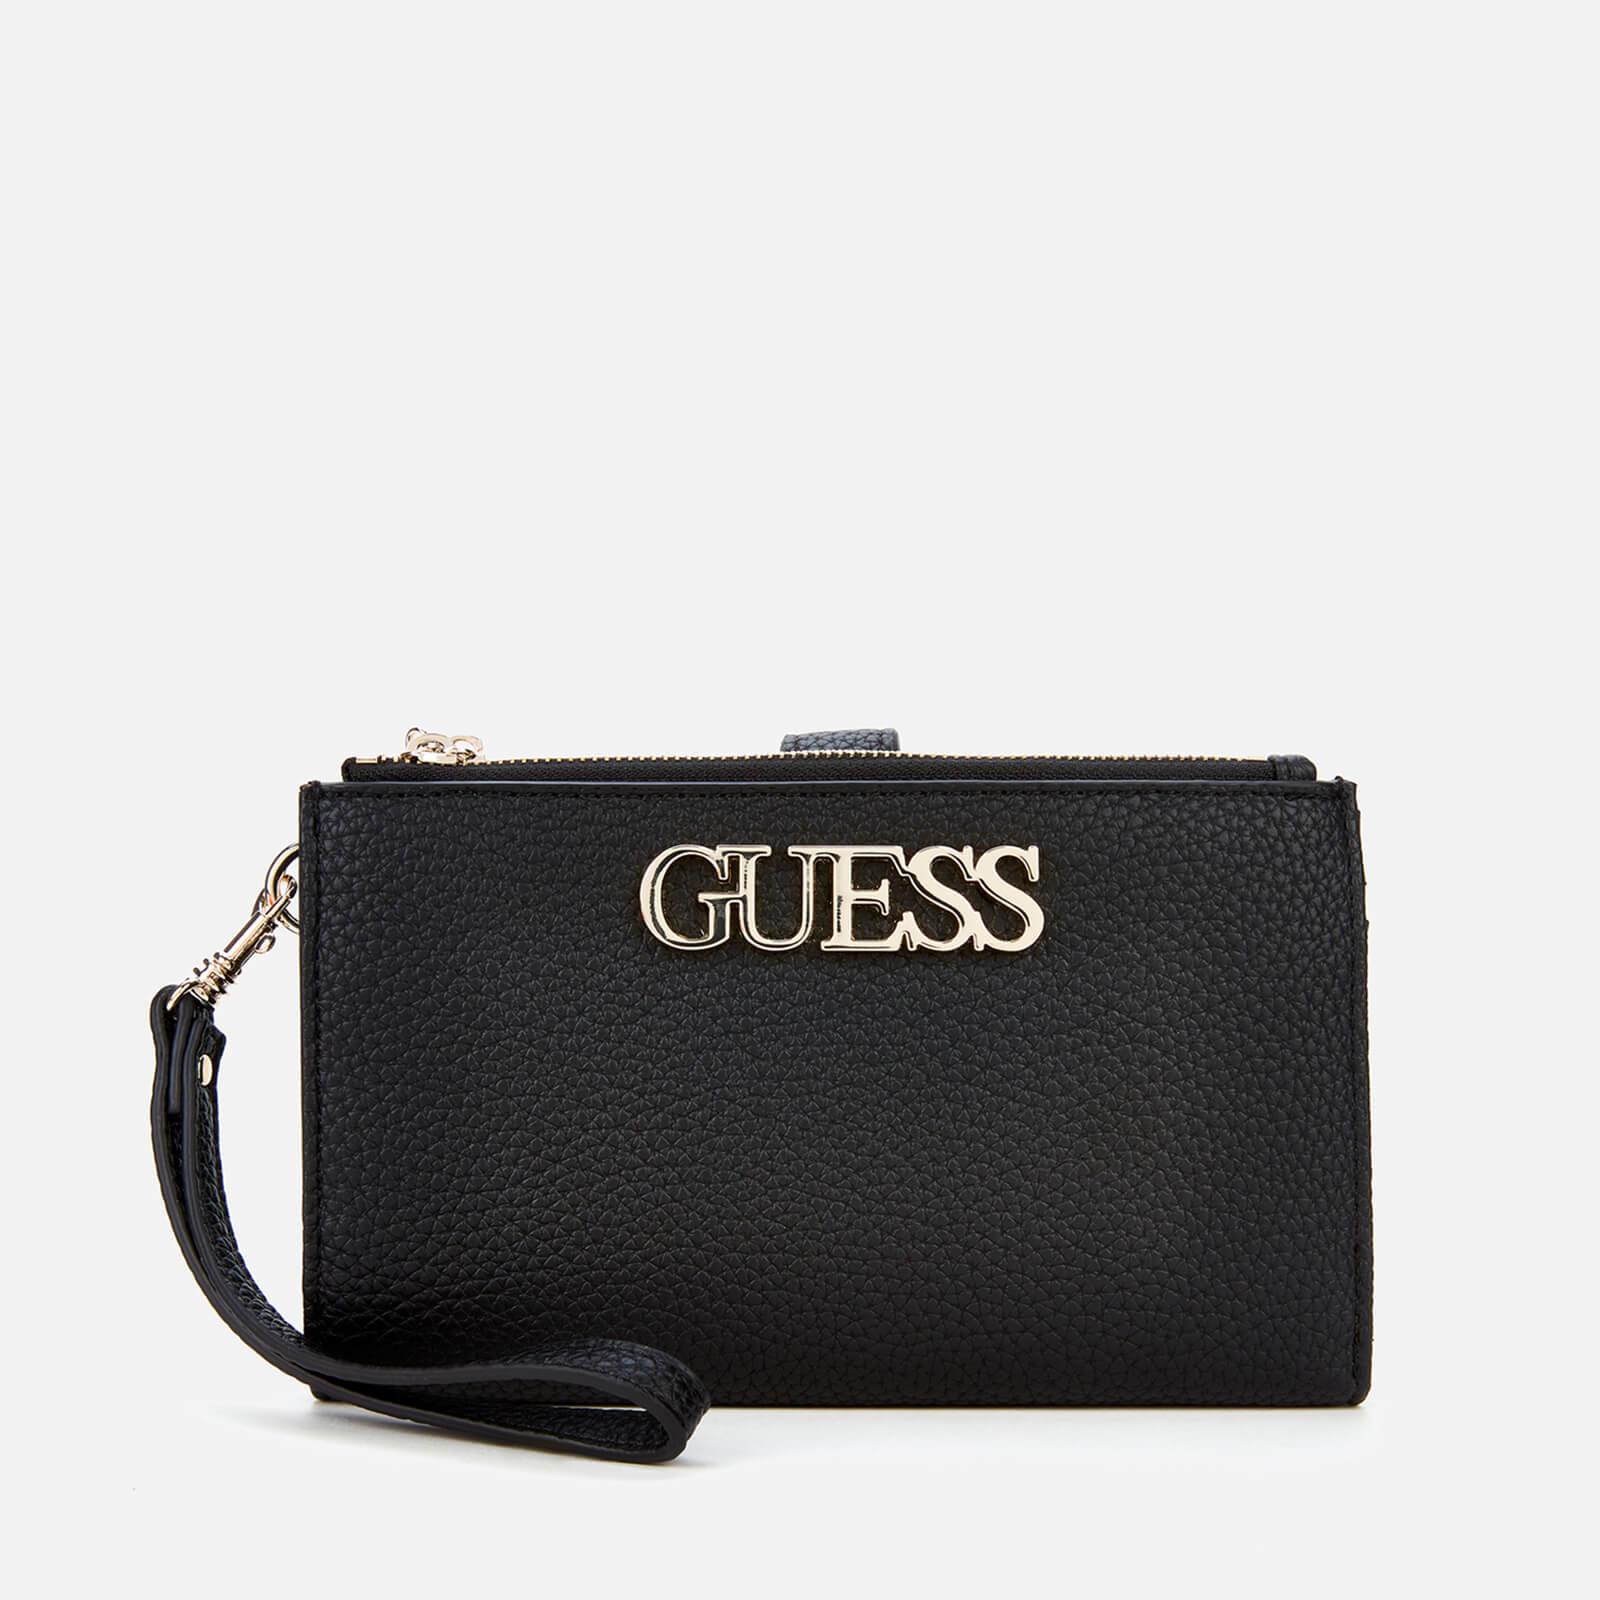 guess women's uptown chic double zip organizer wallet - black